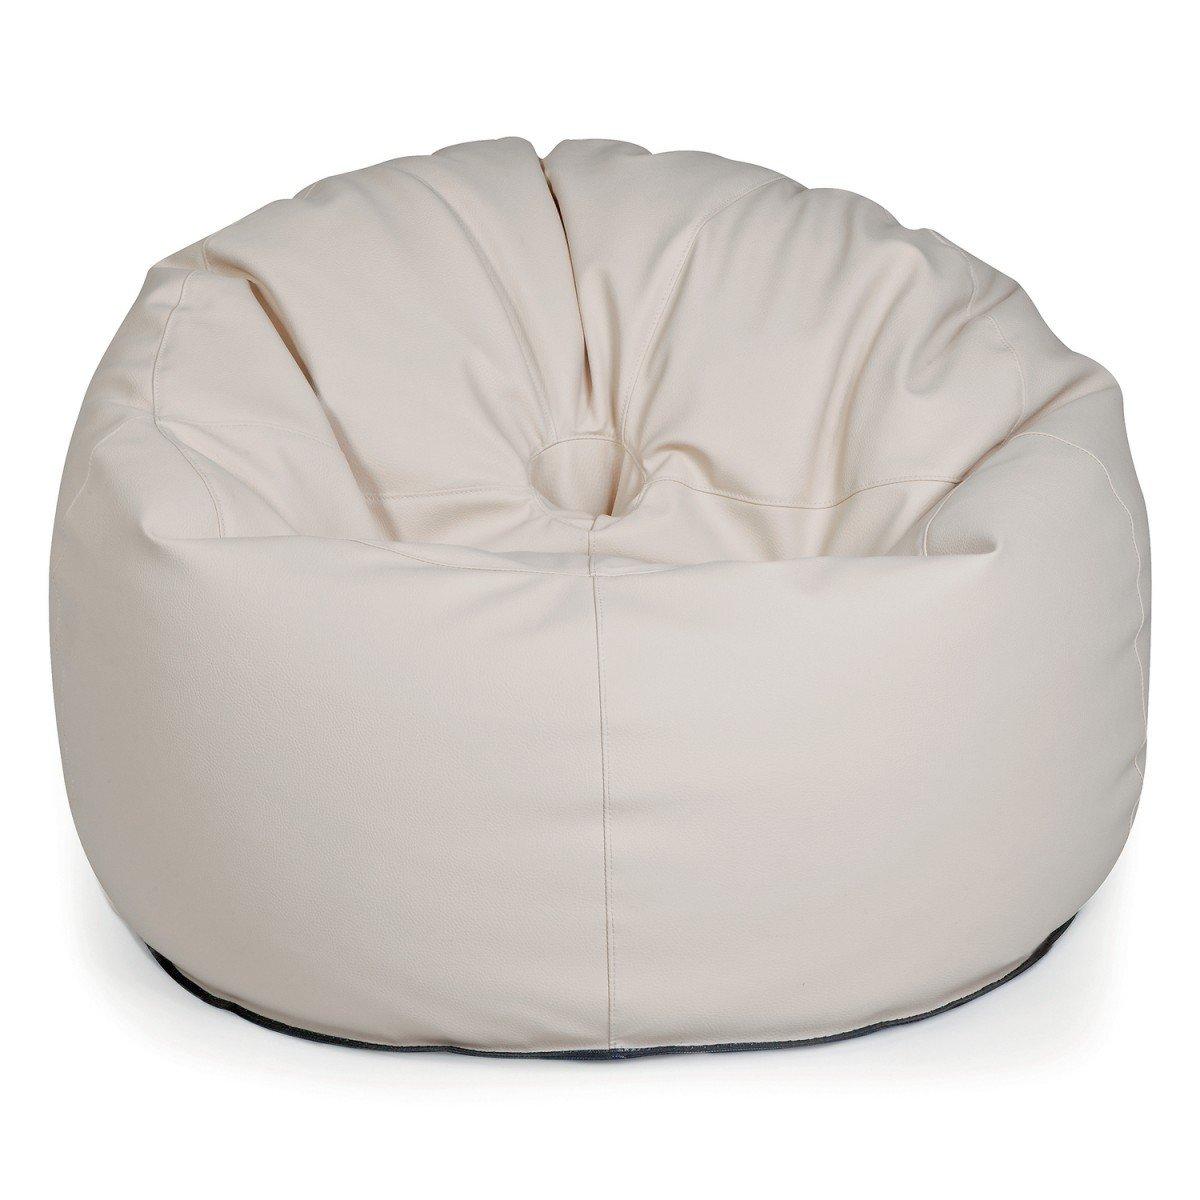 Design Outbag Deluxe Donut Sitzsack 90 x 90 cm Kunststoff Farbe wählbar, Farbe:Sand bestellen